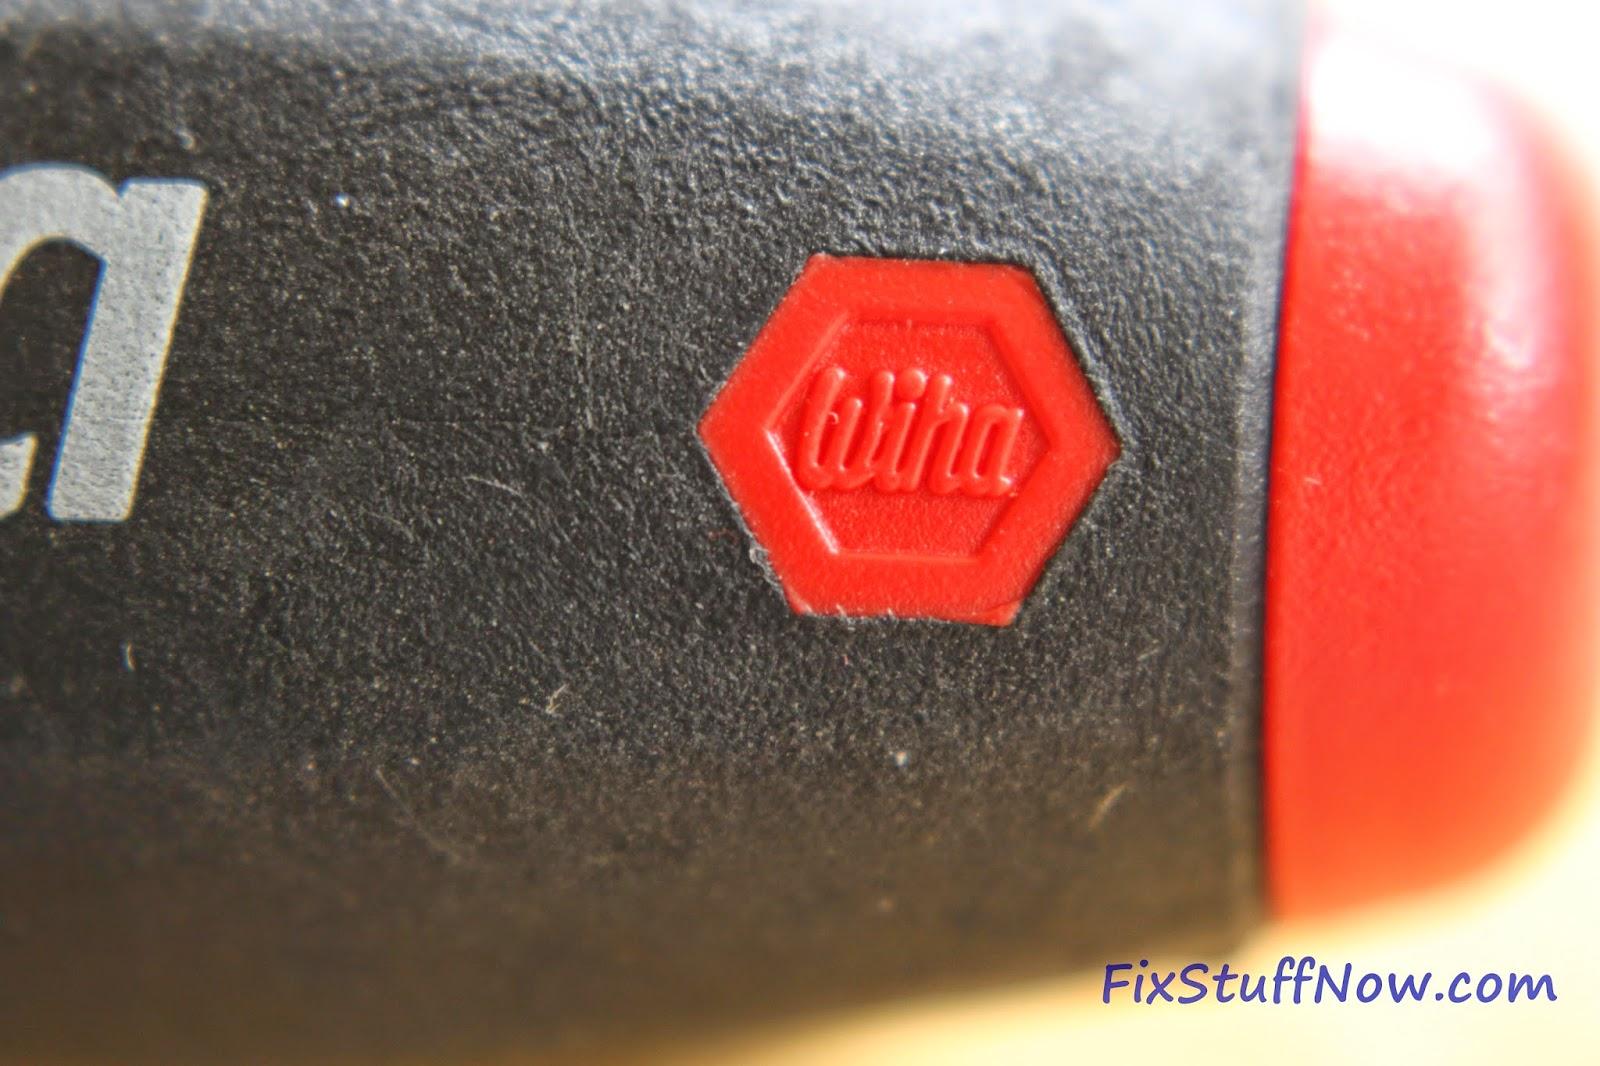 Wiha 36291 Torx Screwdriver Set - Closeup Of Logo